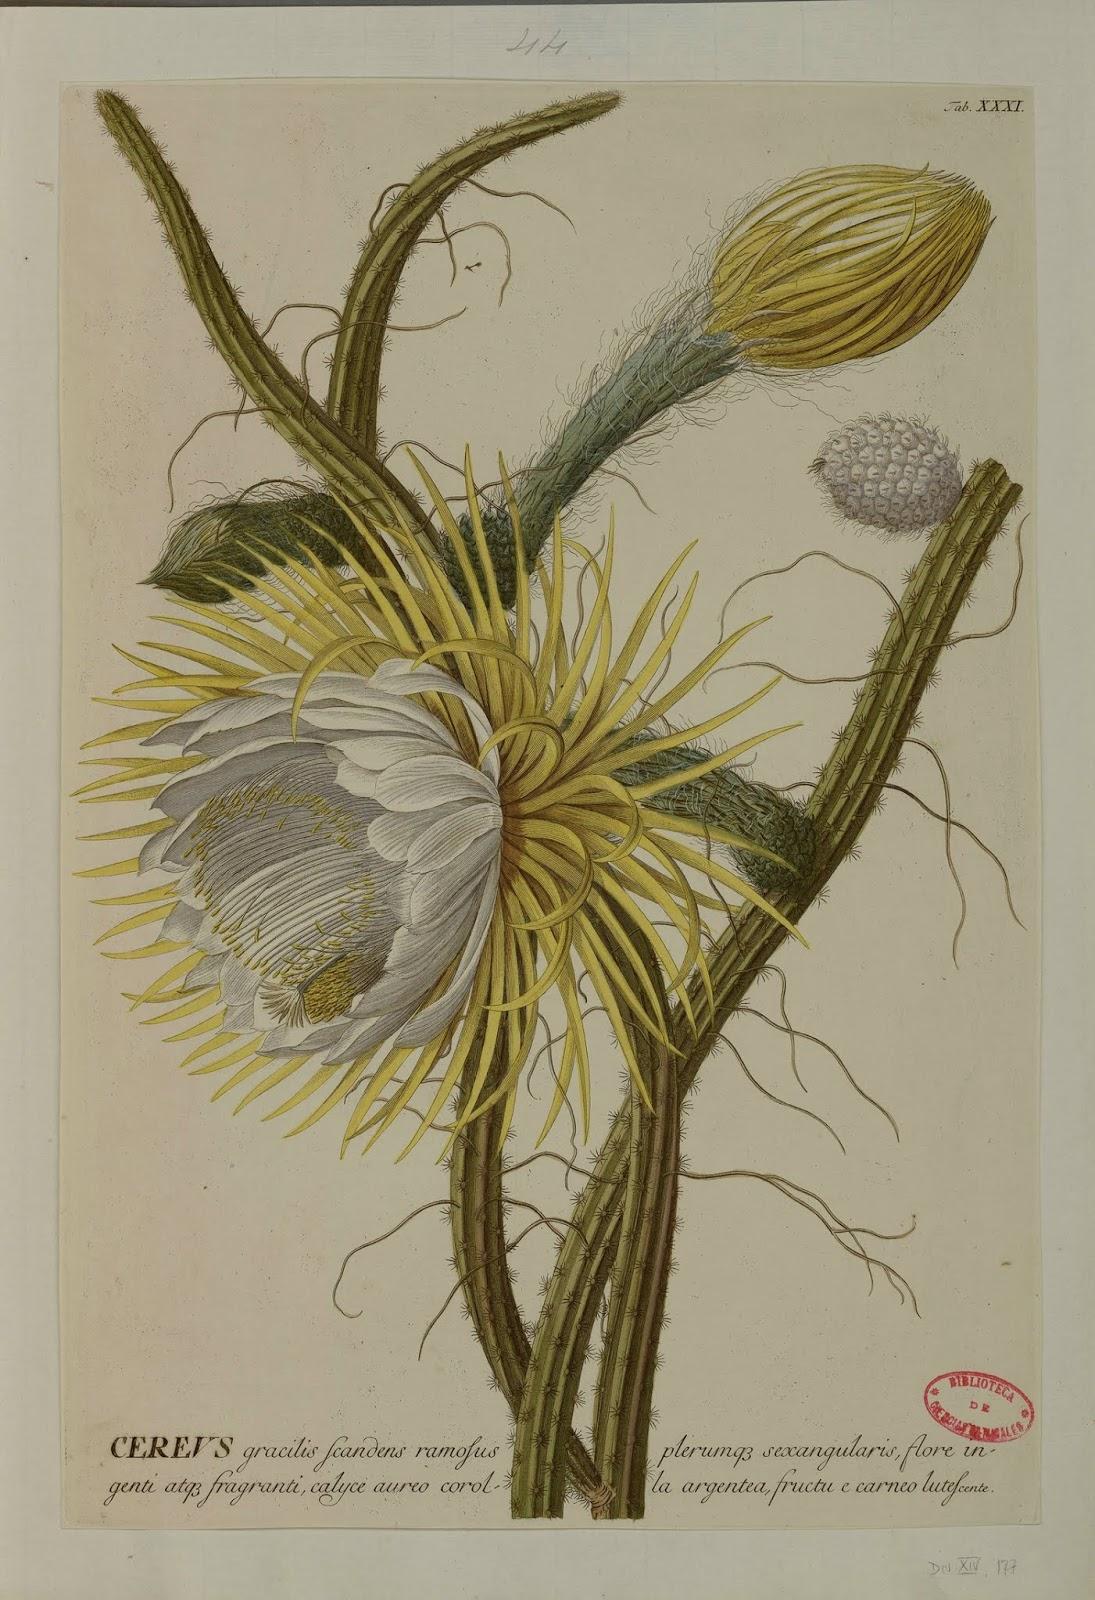 Ilustracion botánica de Flor de cactus